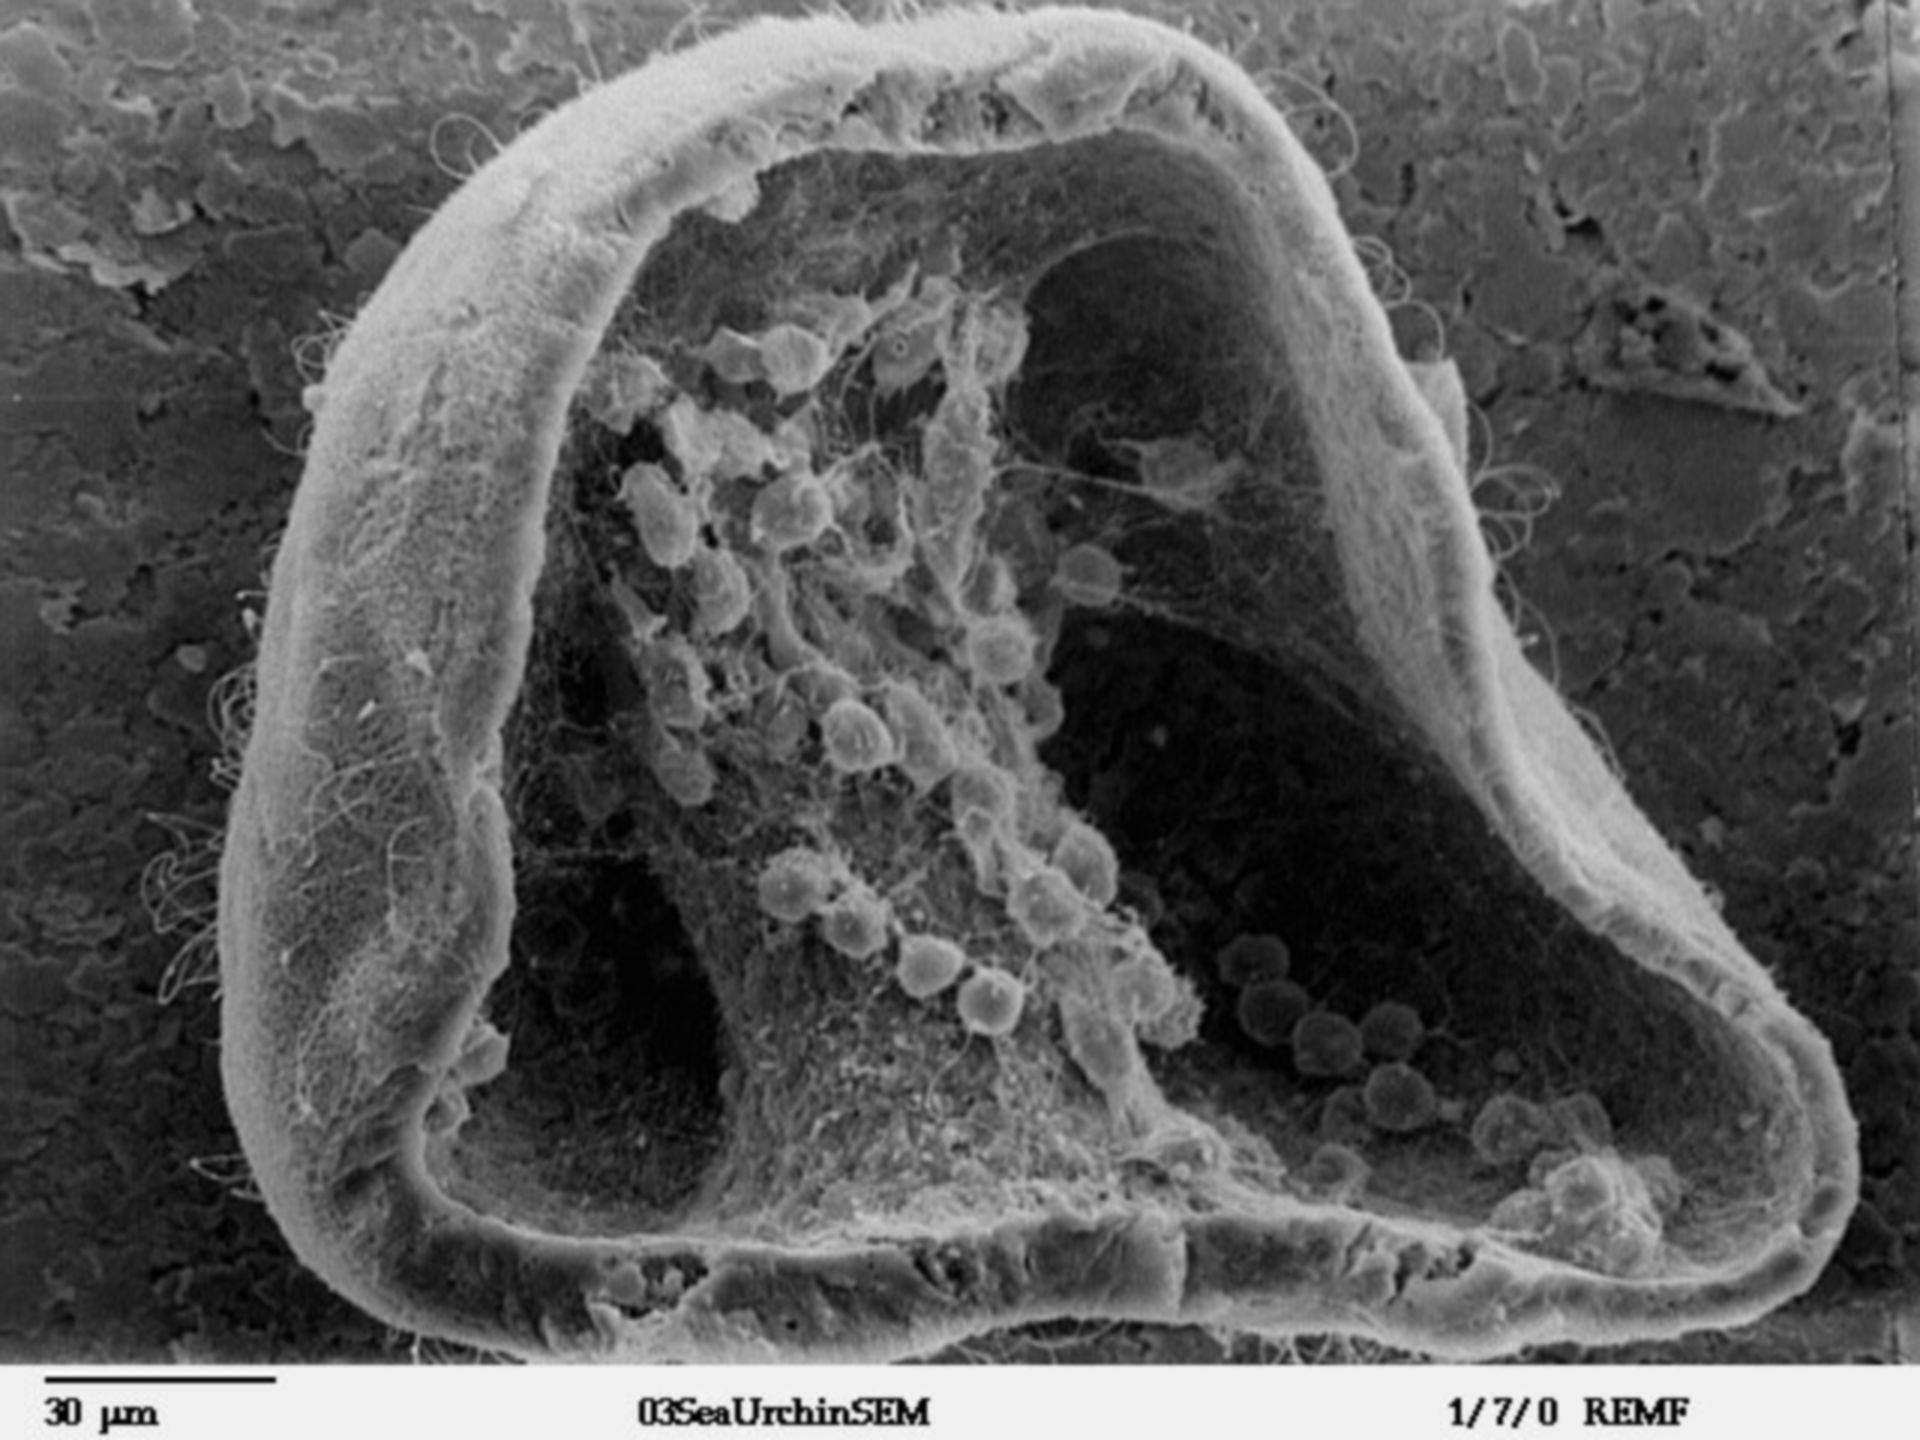 Lytechinus pictus (Extracellular matrix) - CIL:39784